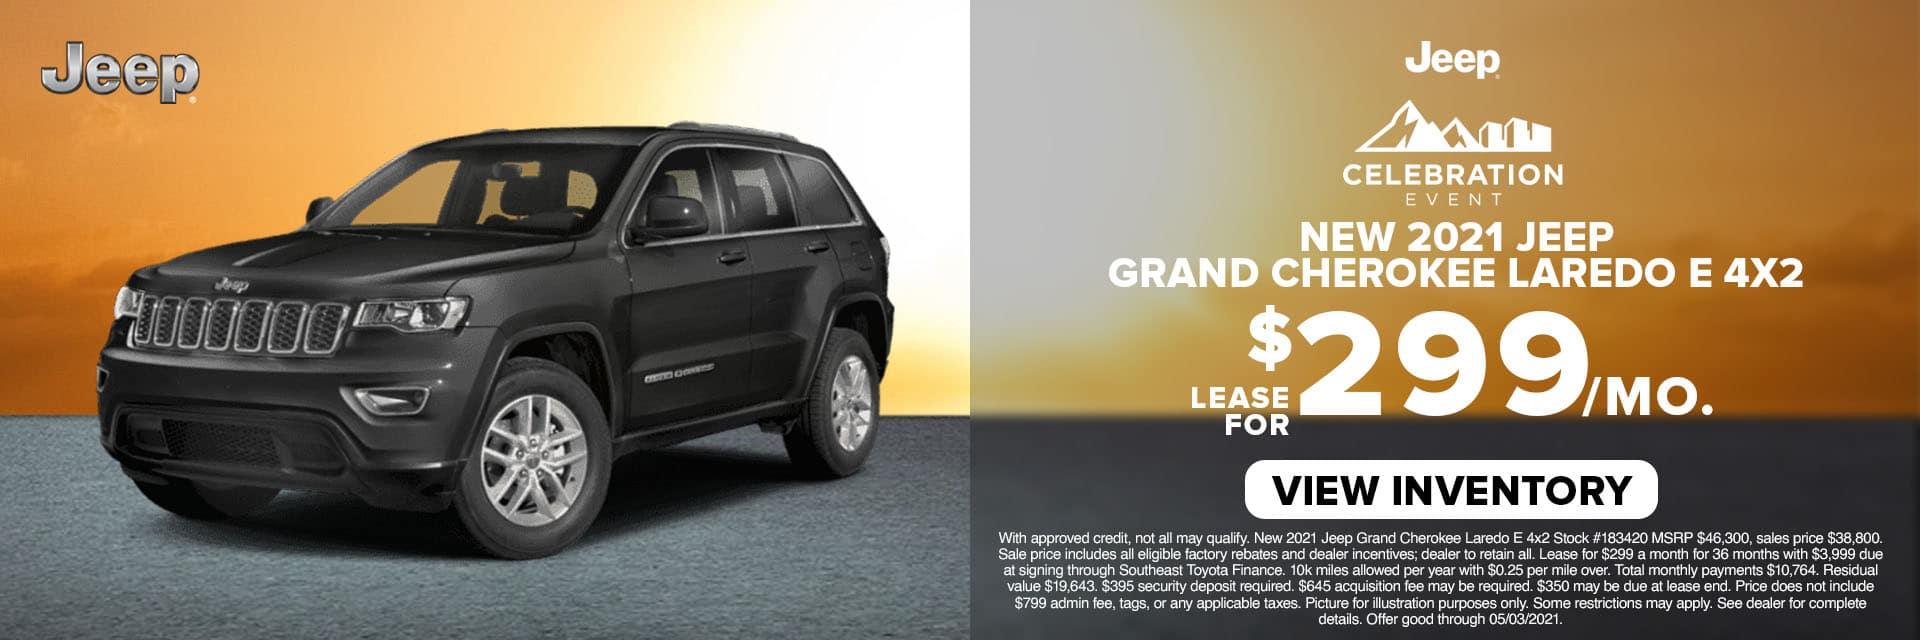 CLCP-April 2021-2020 Jeep Grand Cherokee